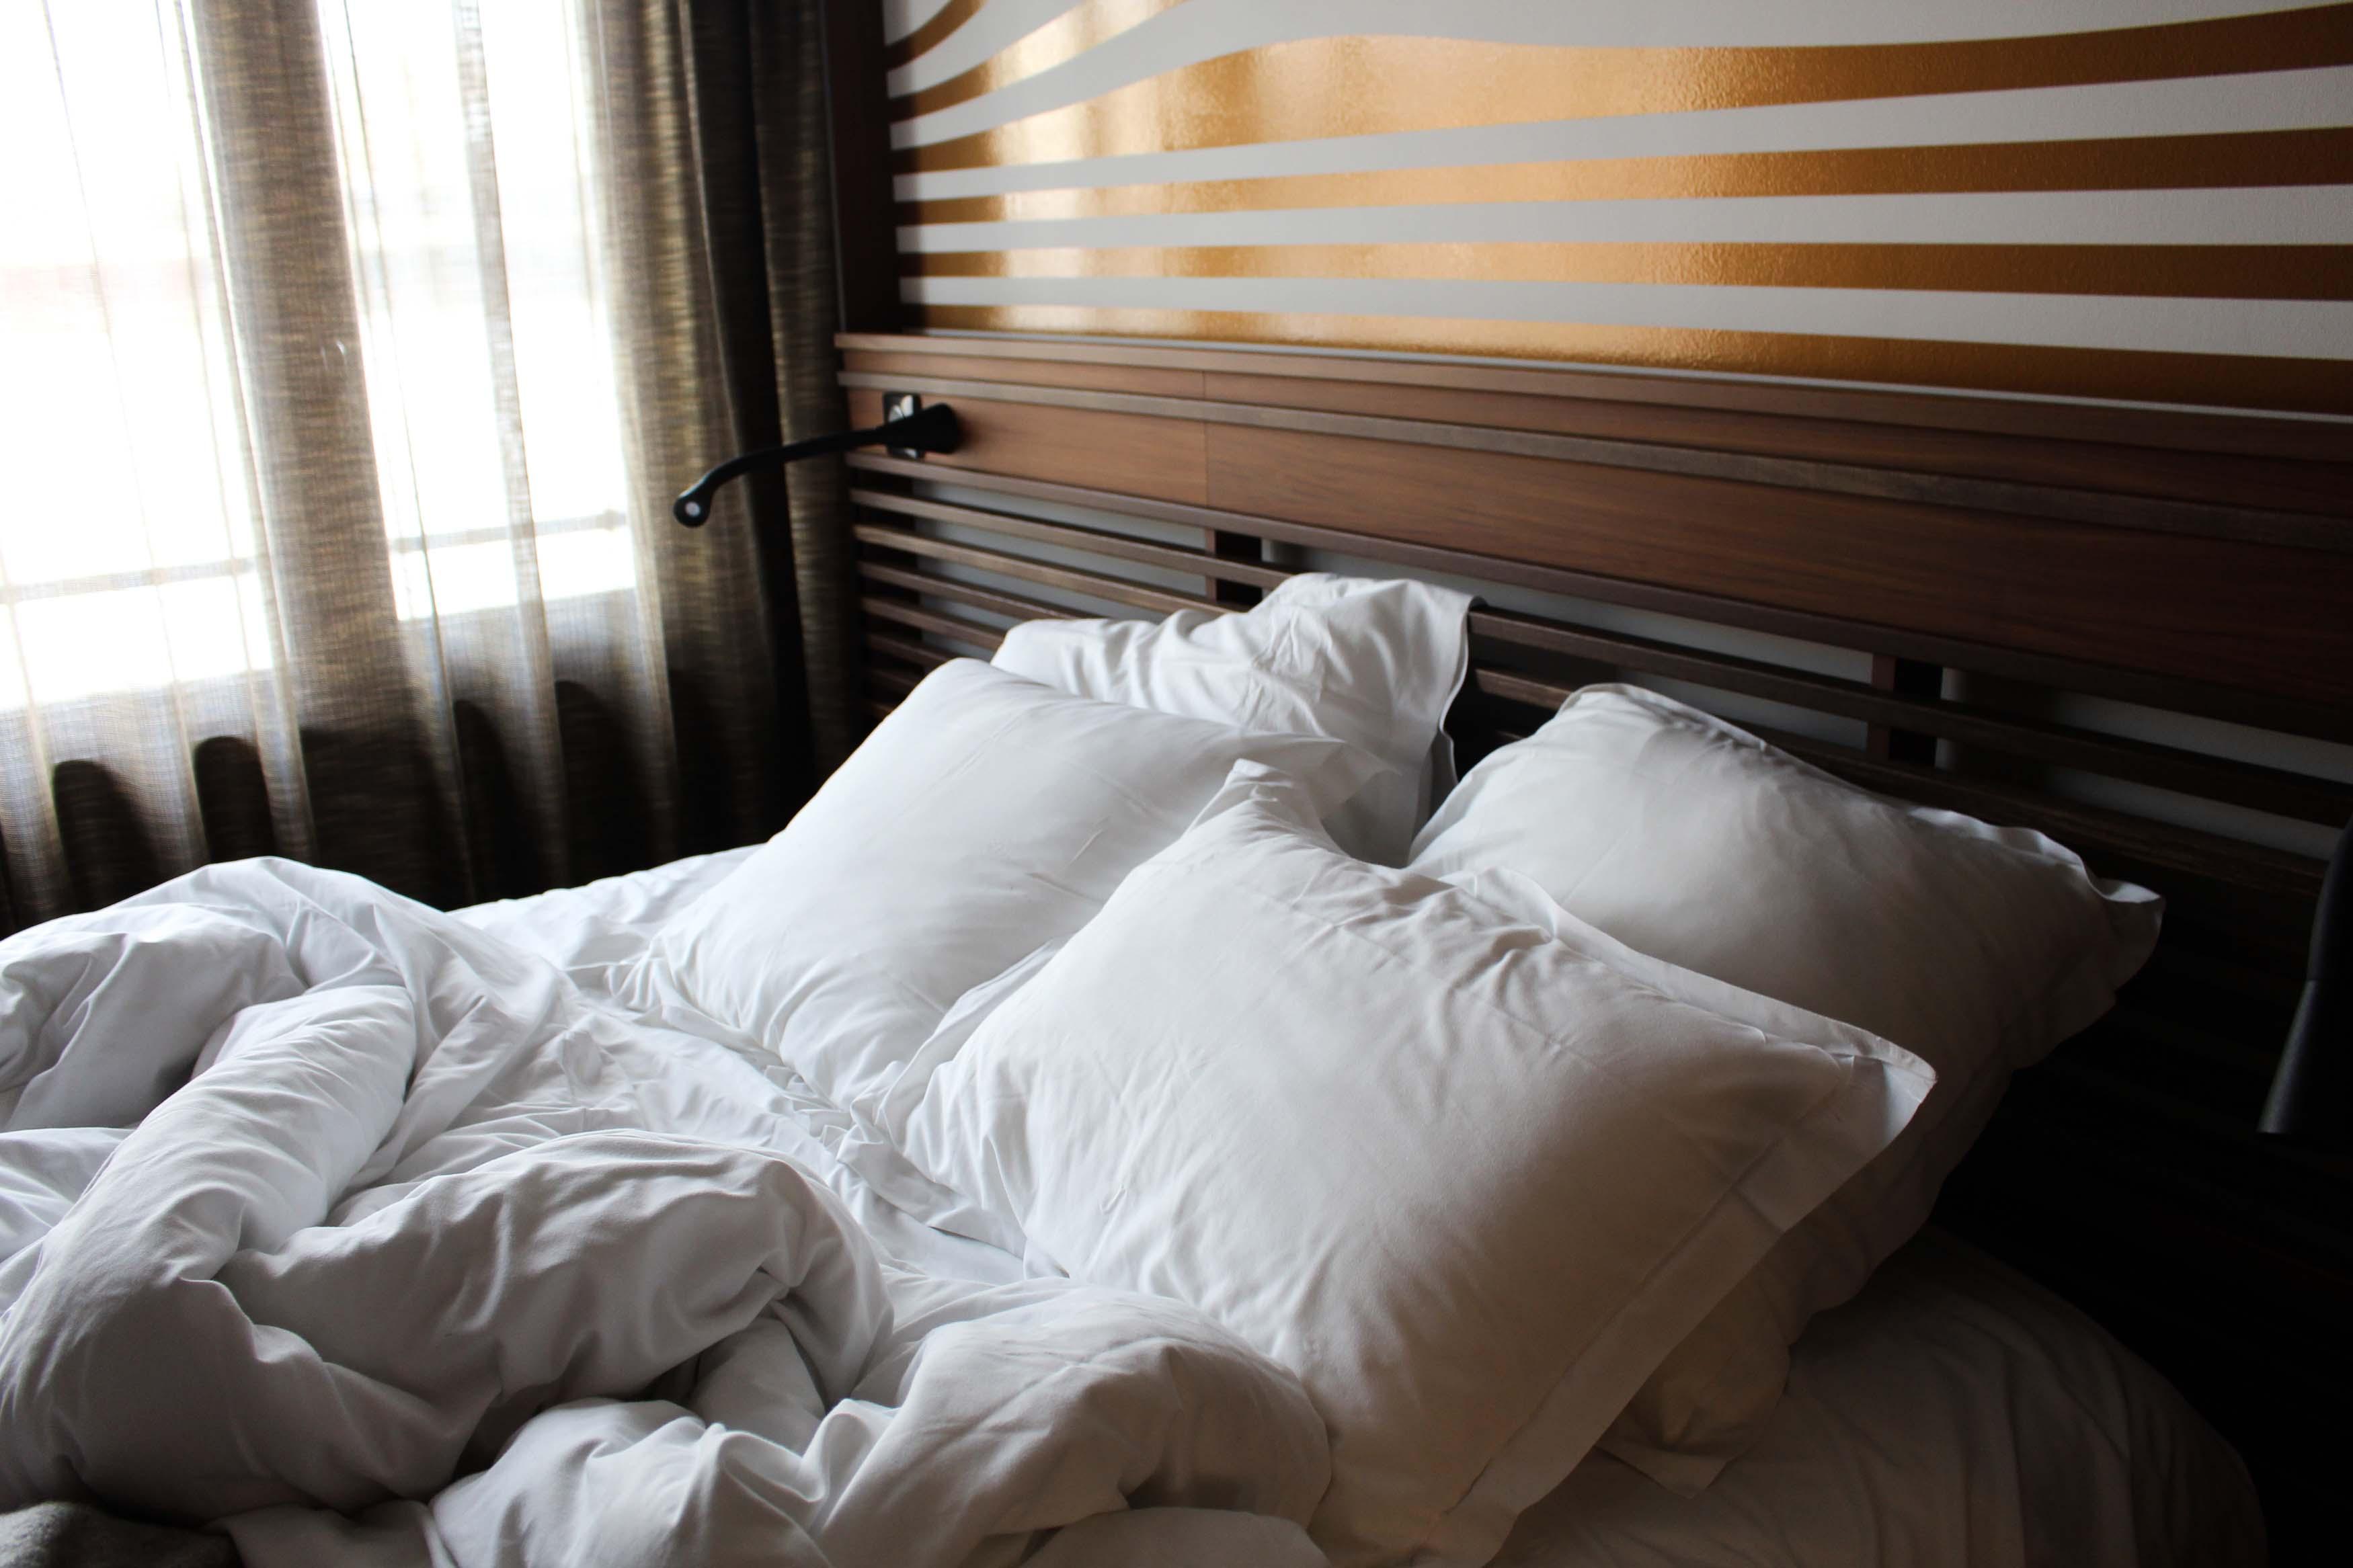 hotel-paris-offparisseine-linstantflo-17-sur-18